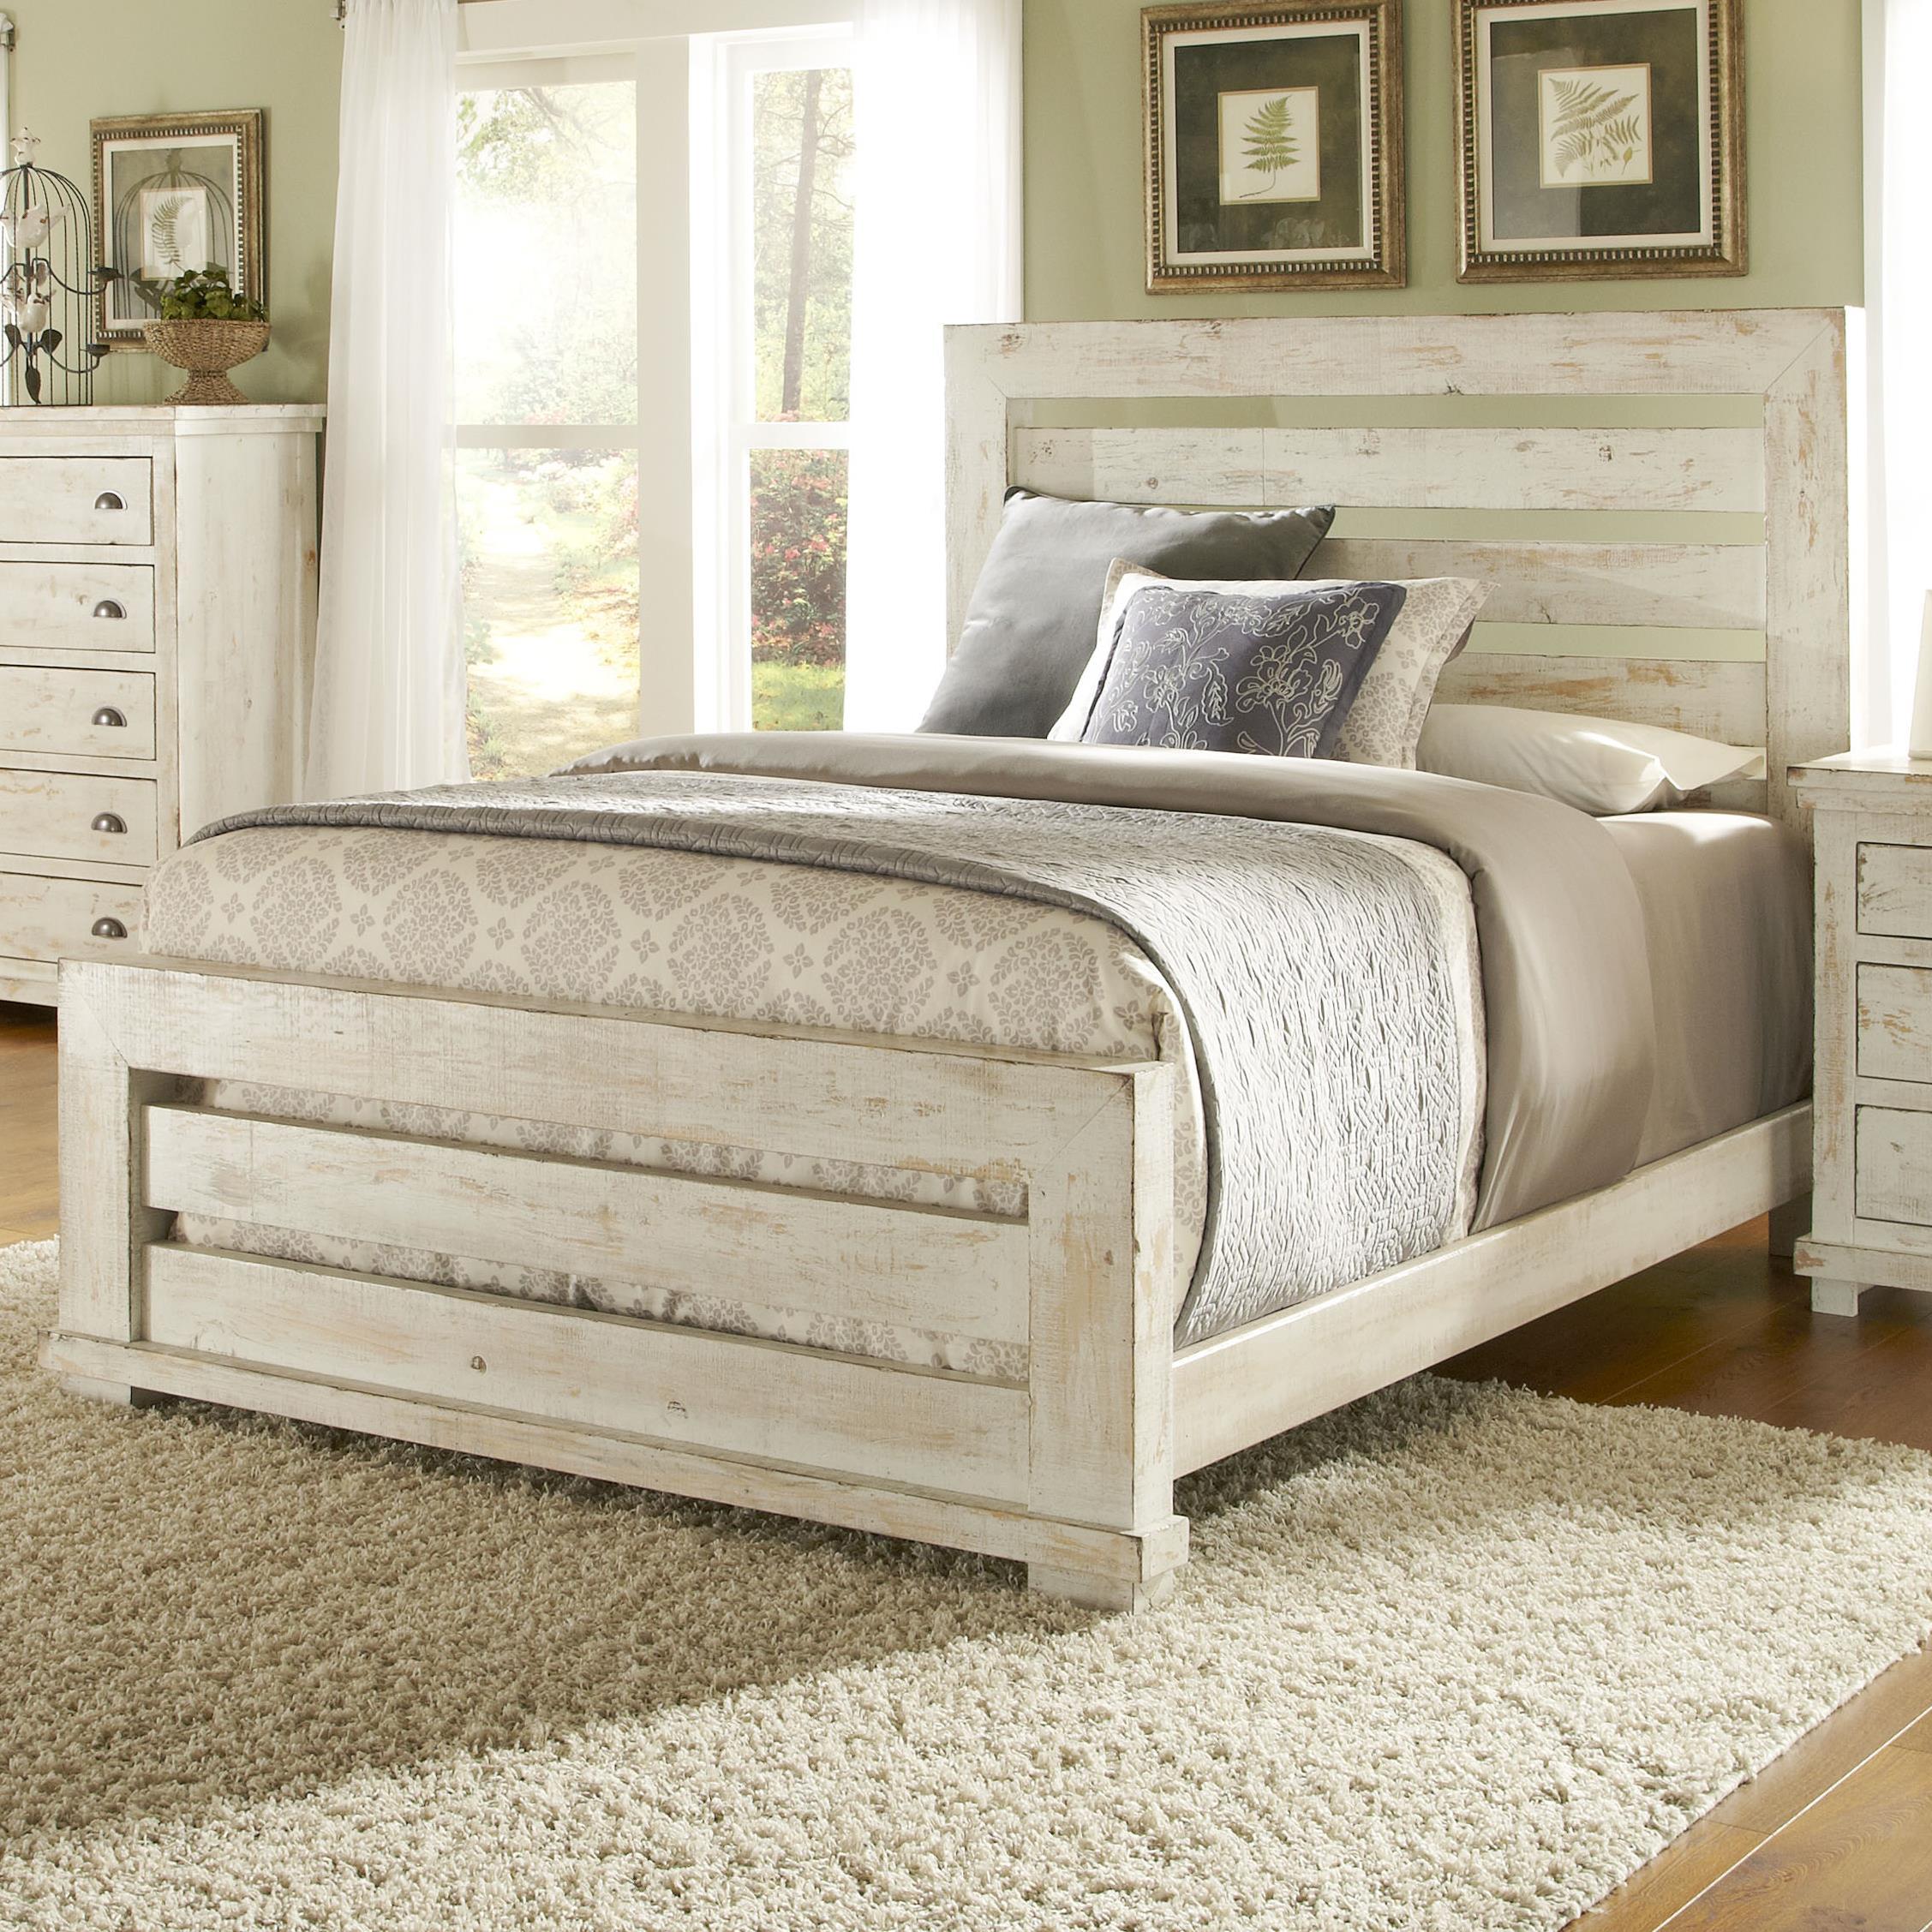 Willow California King Slat Bed by Progressive Furniture at Bullard Furniture